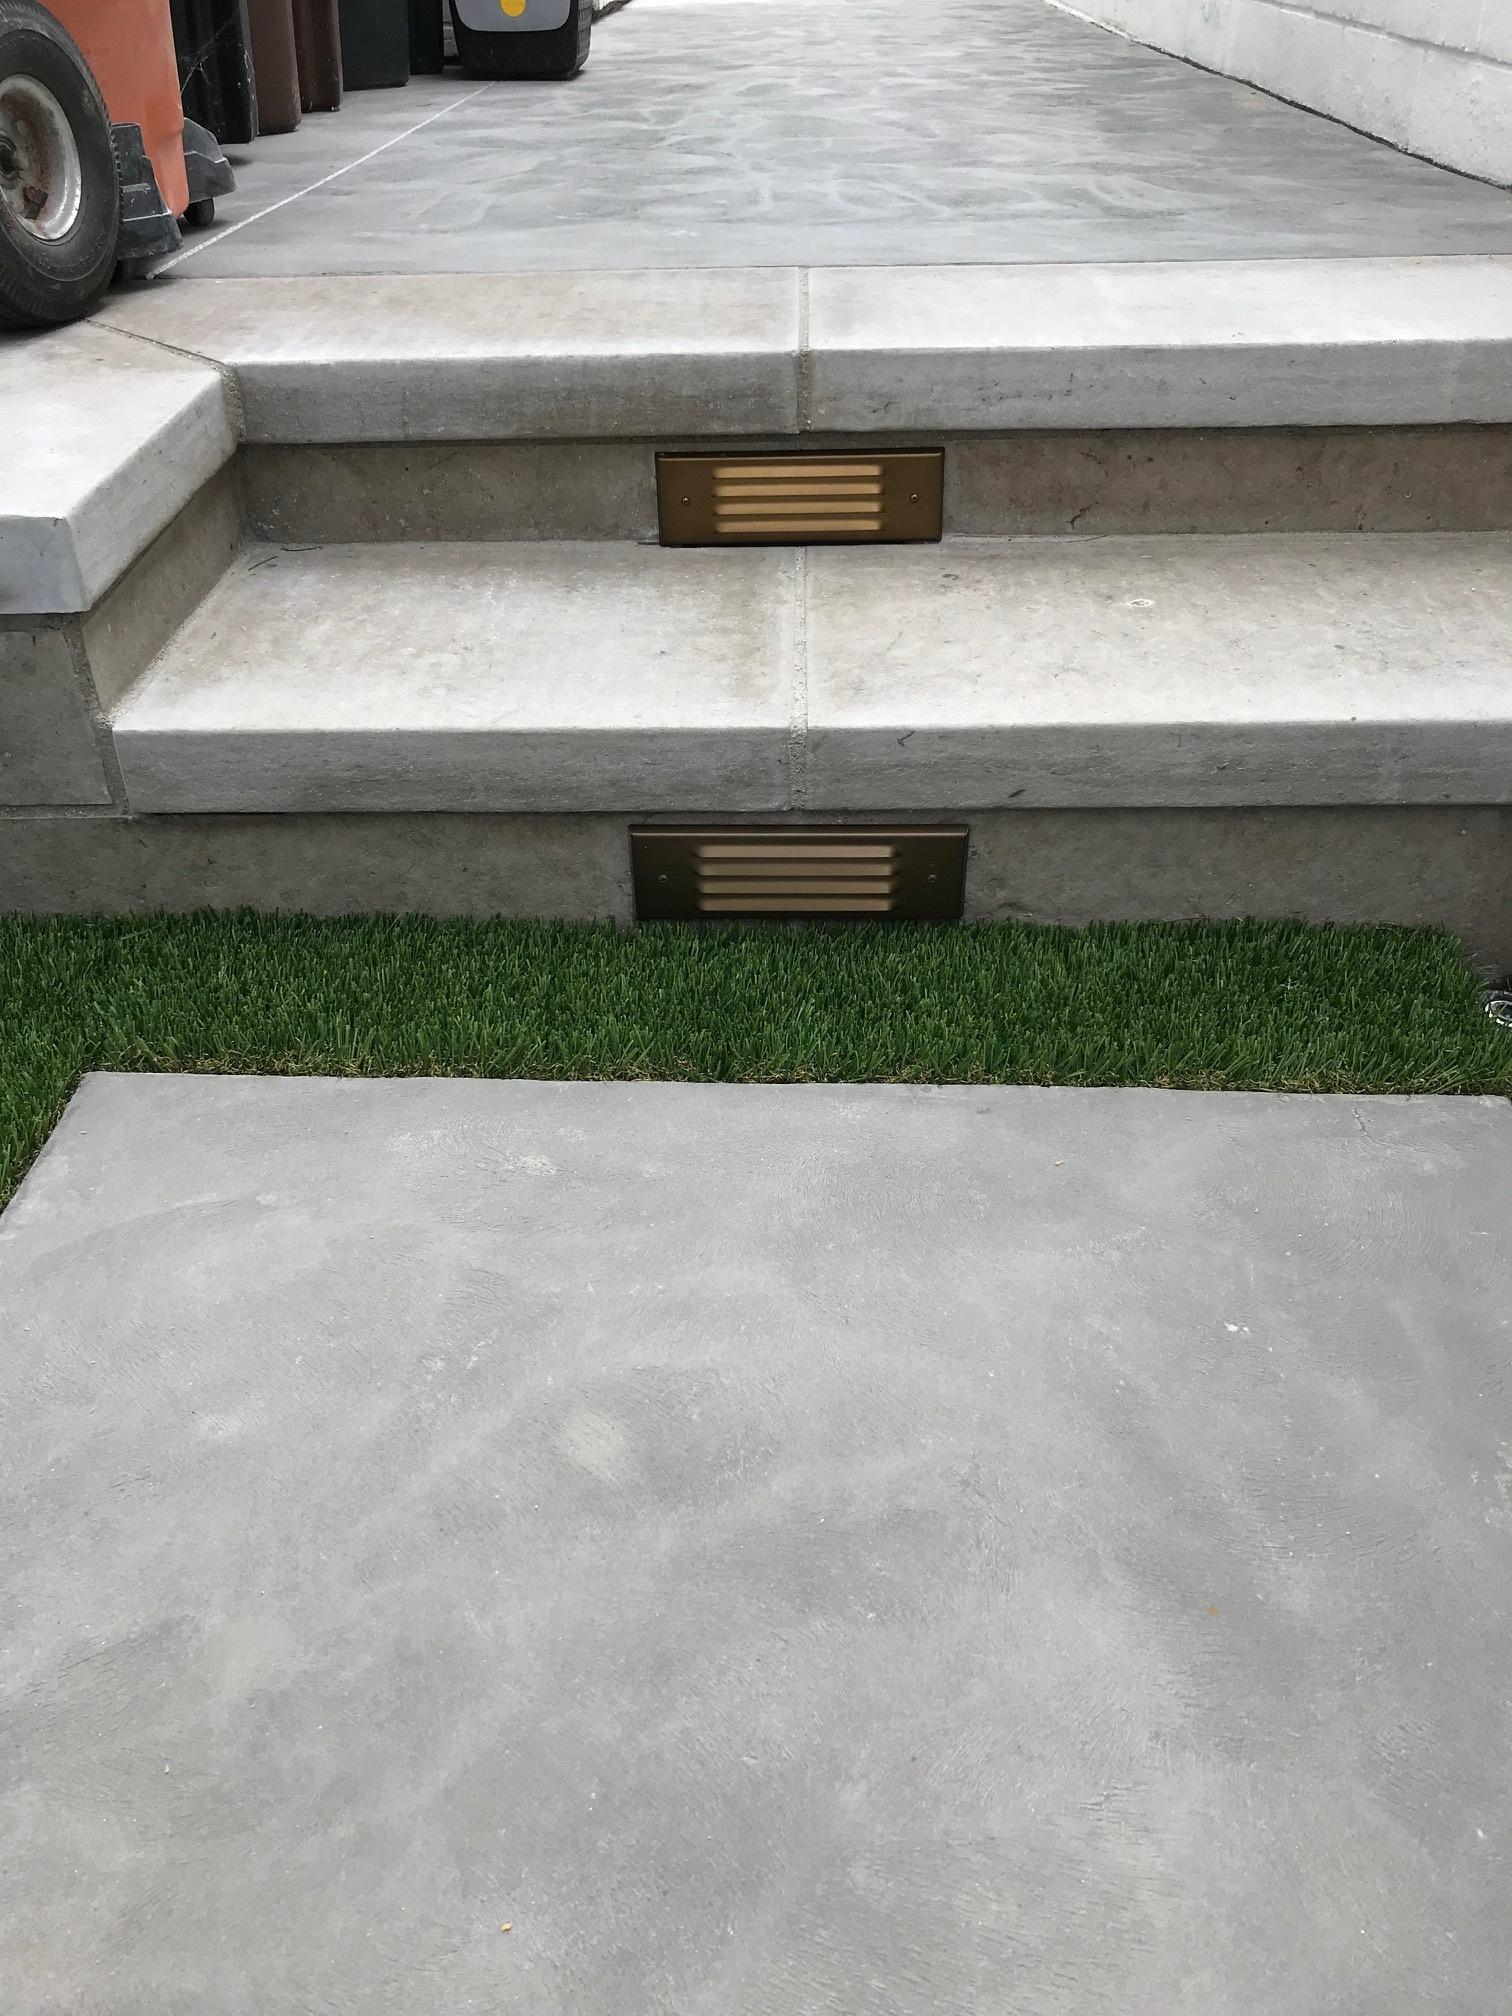 Concrete steps built after excavation work in Dana Point